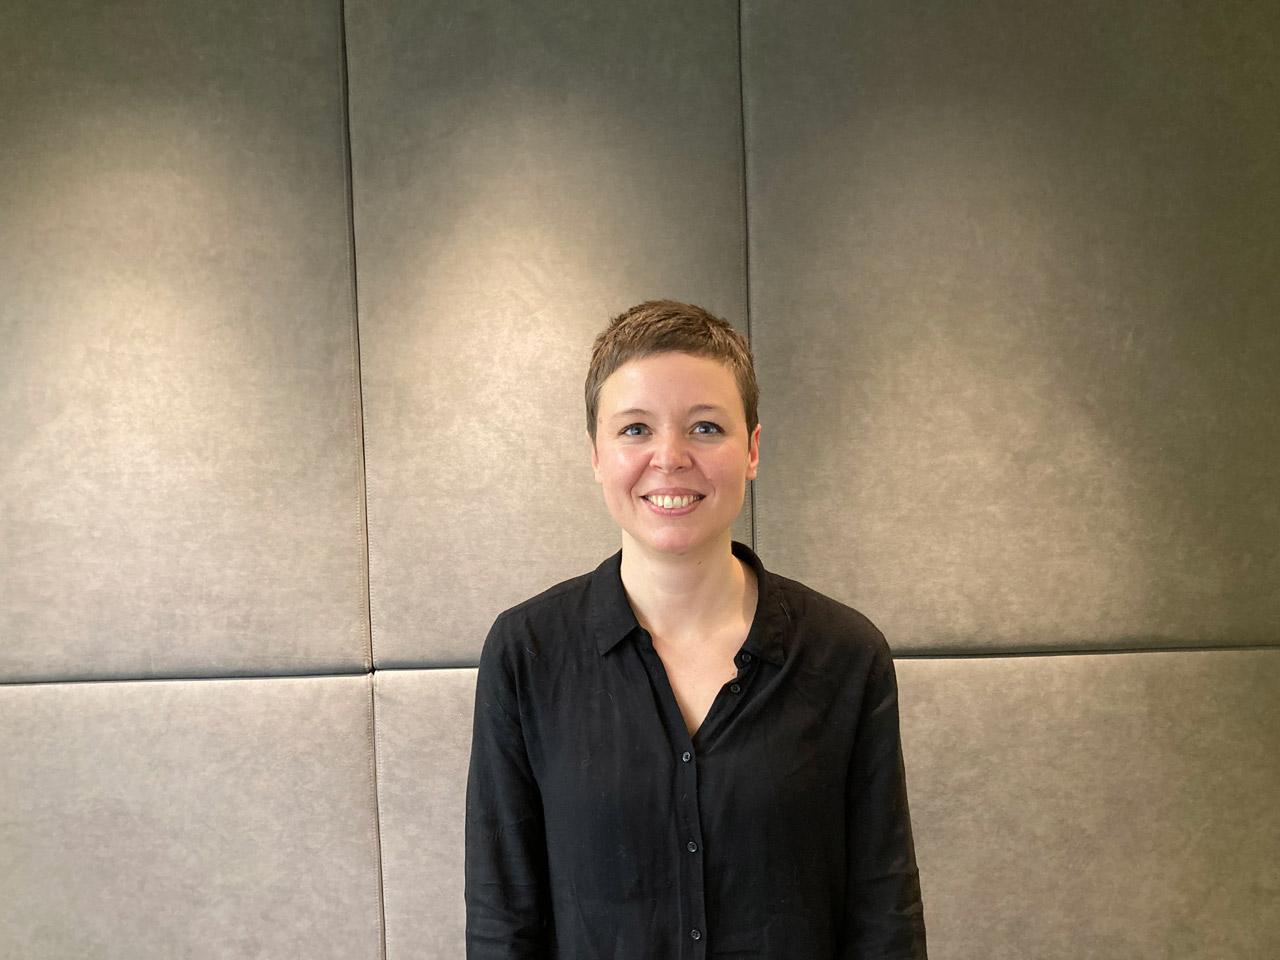 Johanna Hieblinger